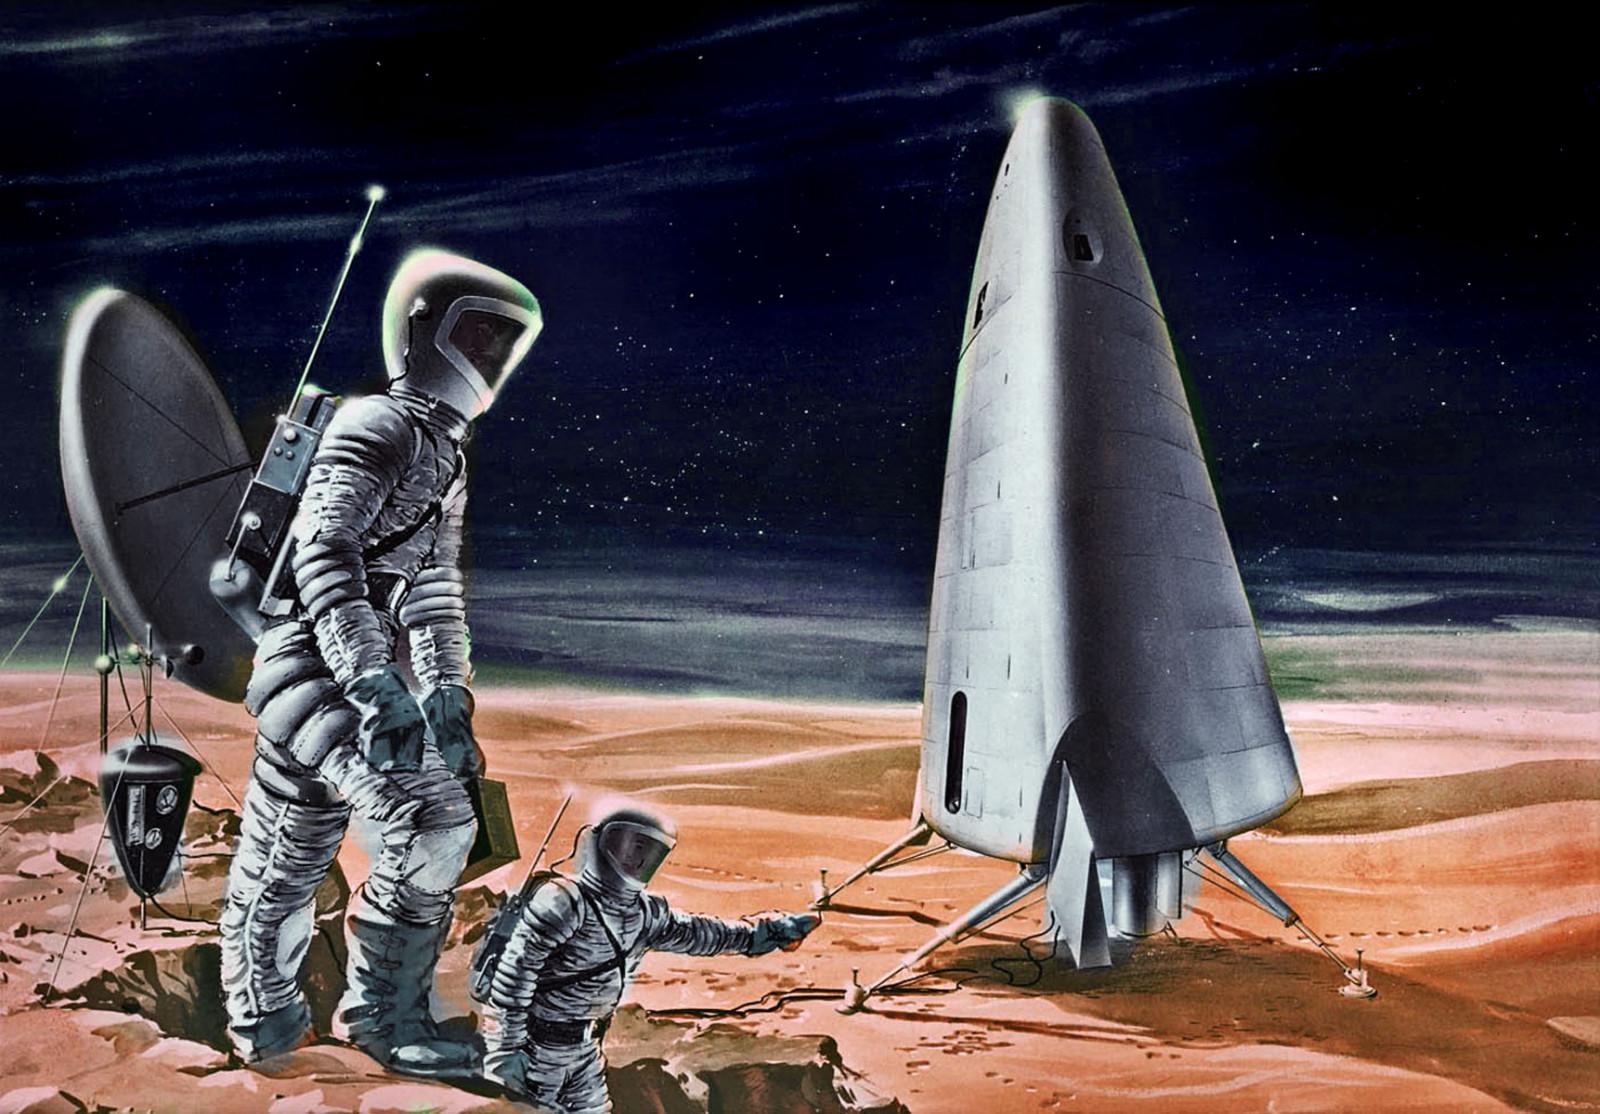 Masaustu Boyama Astronot Bosluk Su Sanat Gokyuzu Uzay